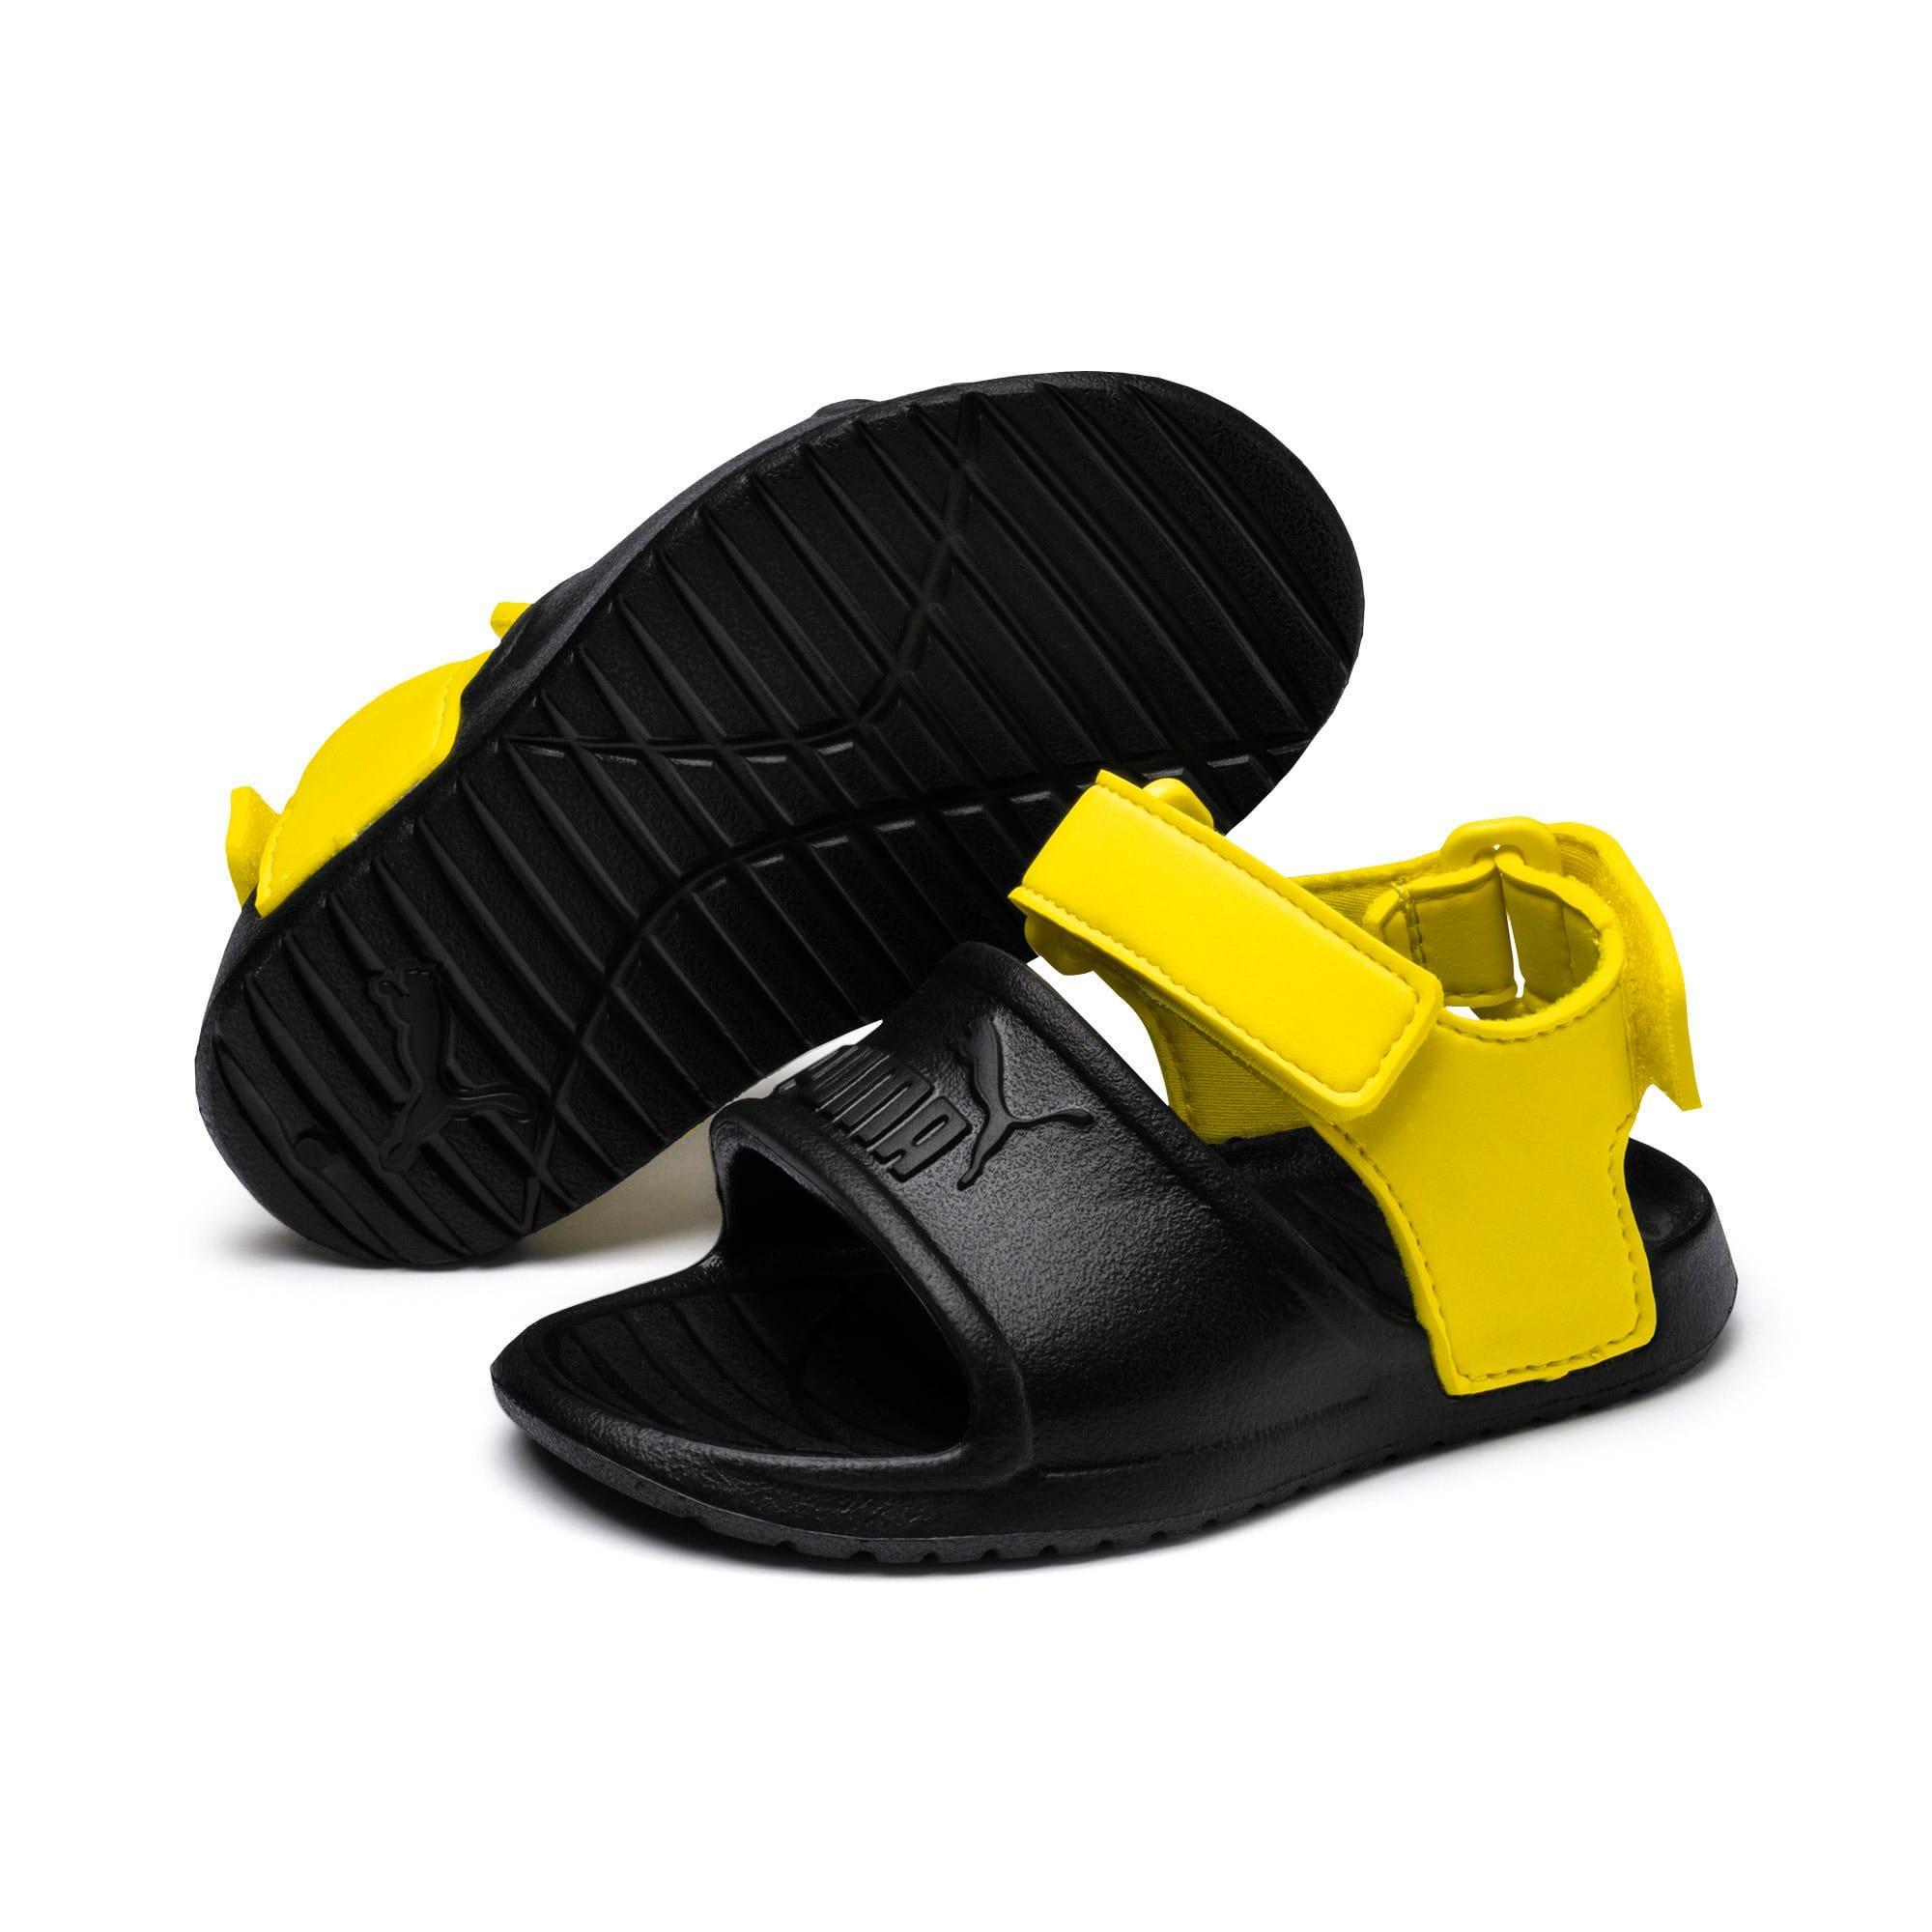 Thumbnail 2 of Divecat v2 Injex Kids' Sandals, Puma Black-Blazing Yellow, medium